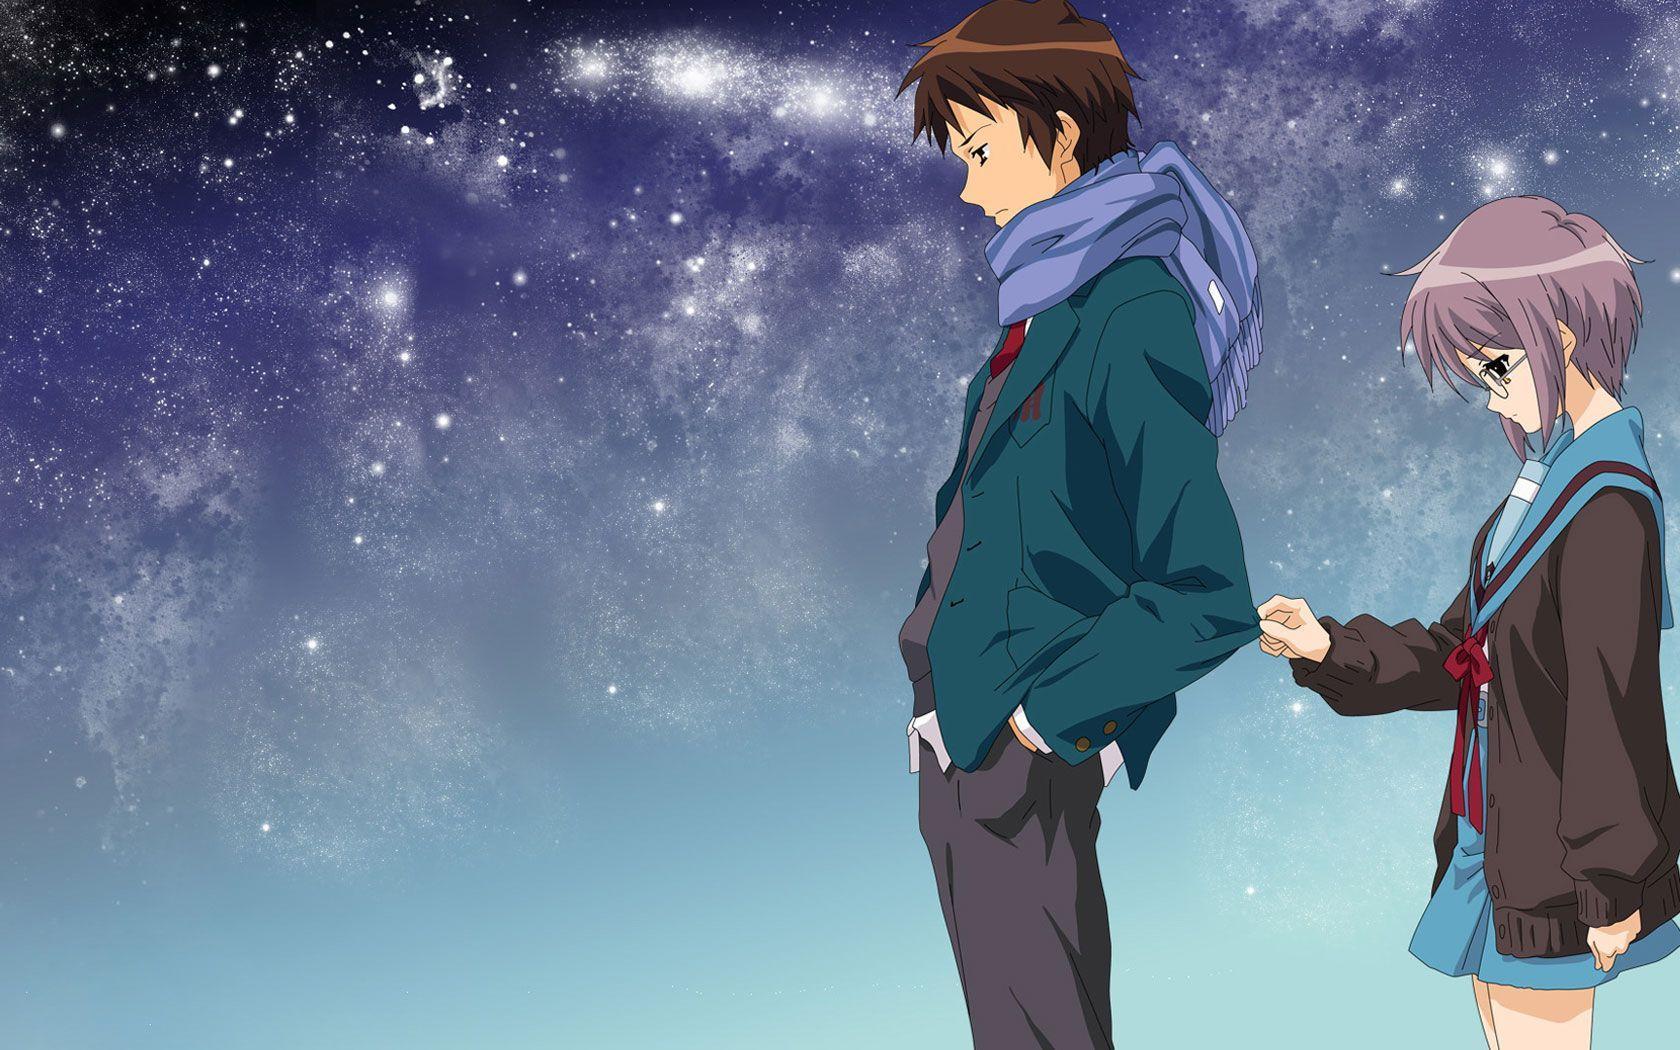 anime couple hugging wallpapers - photo #26